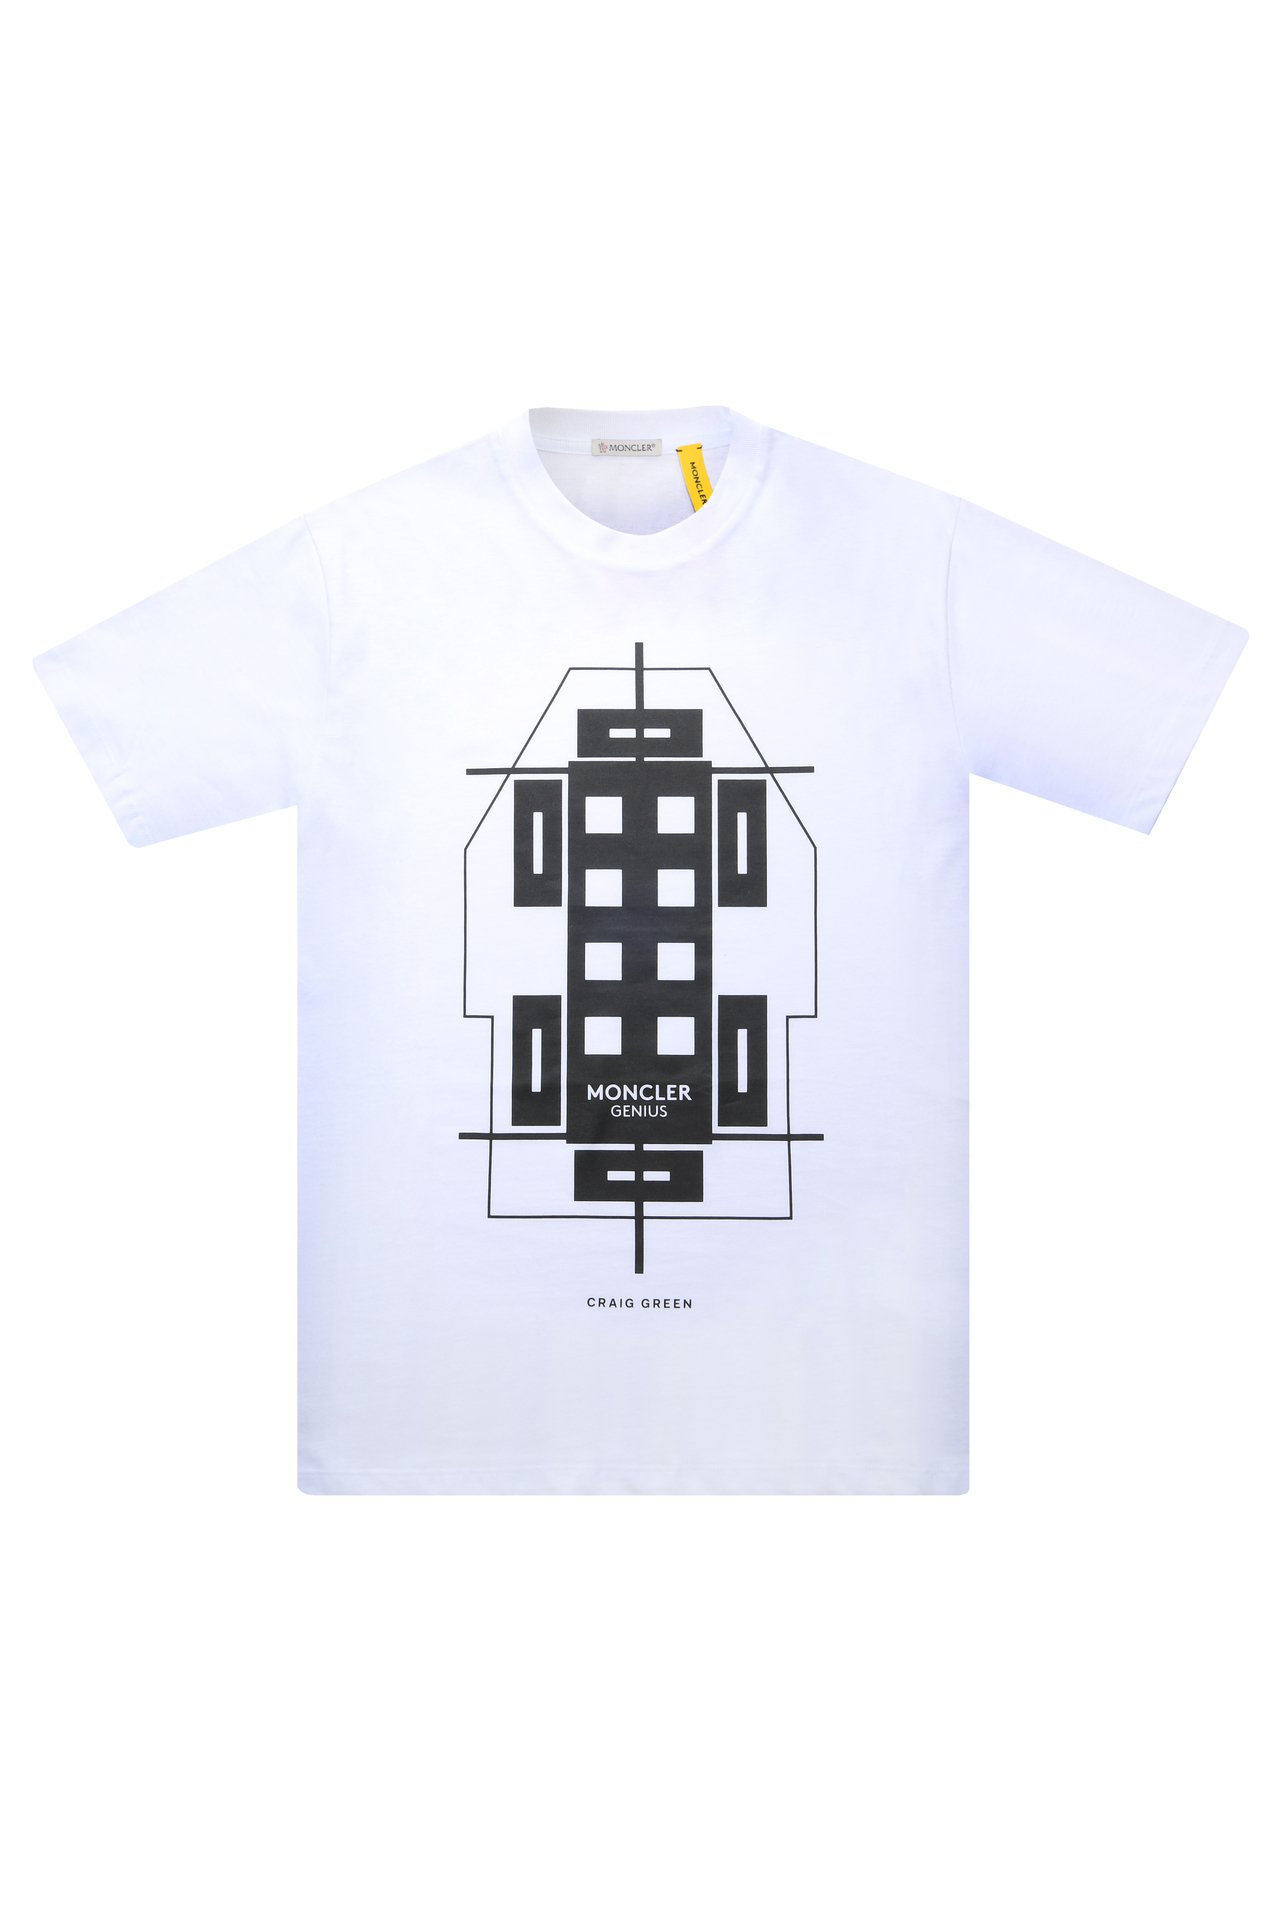 MONCLER Genius系列Craig Green T恤,售價7,500元。...